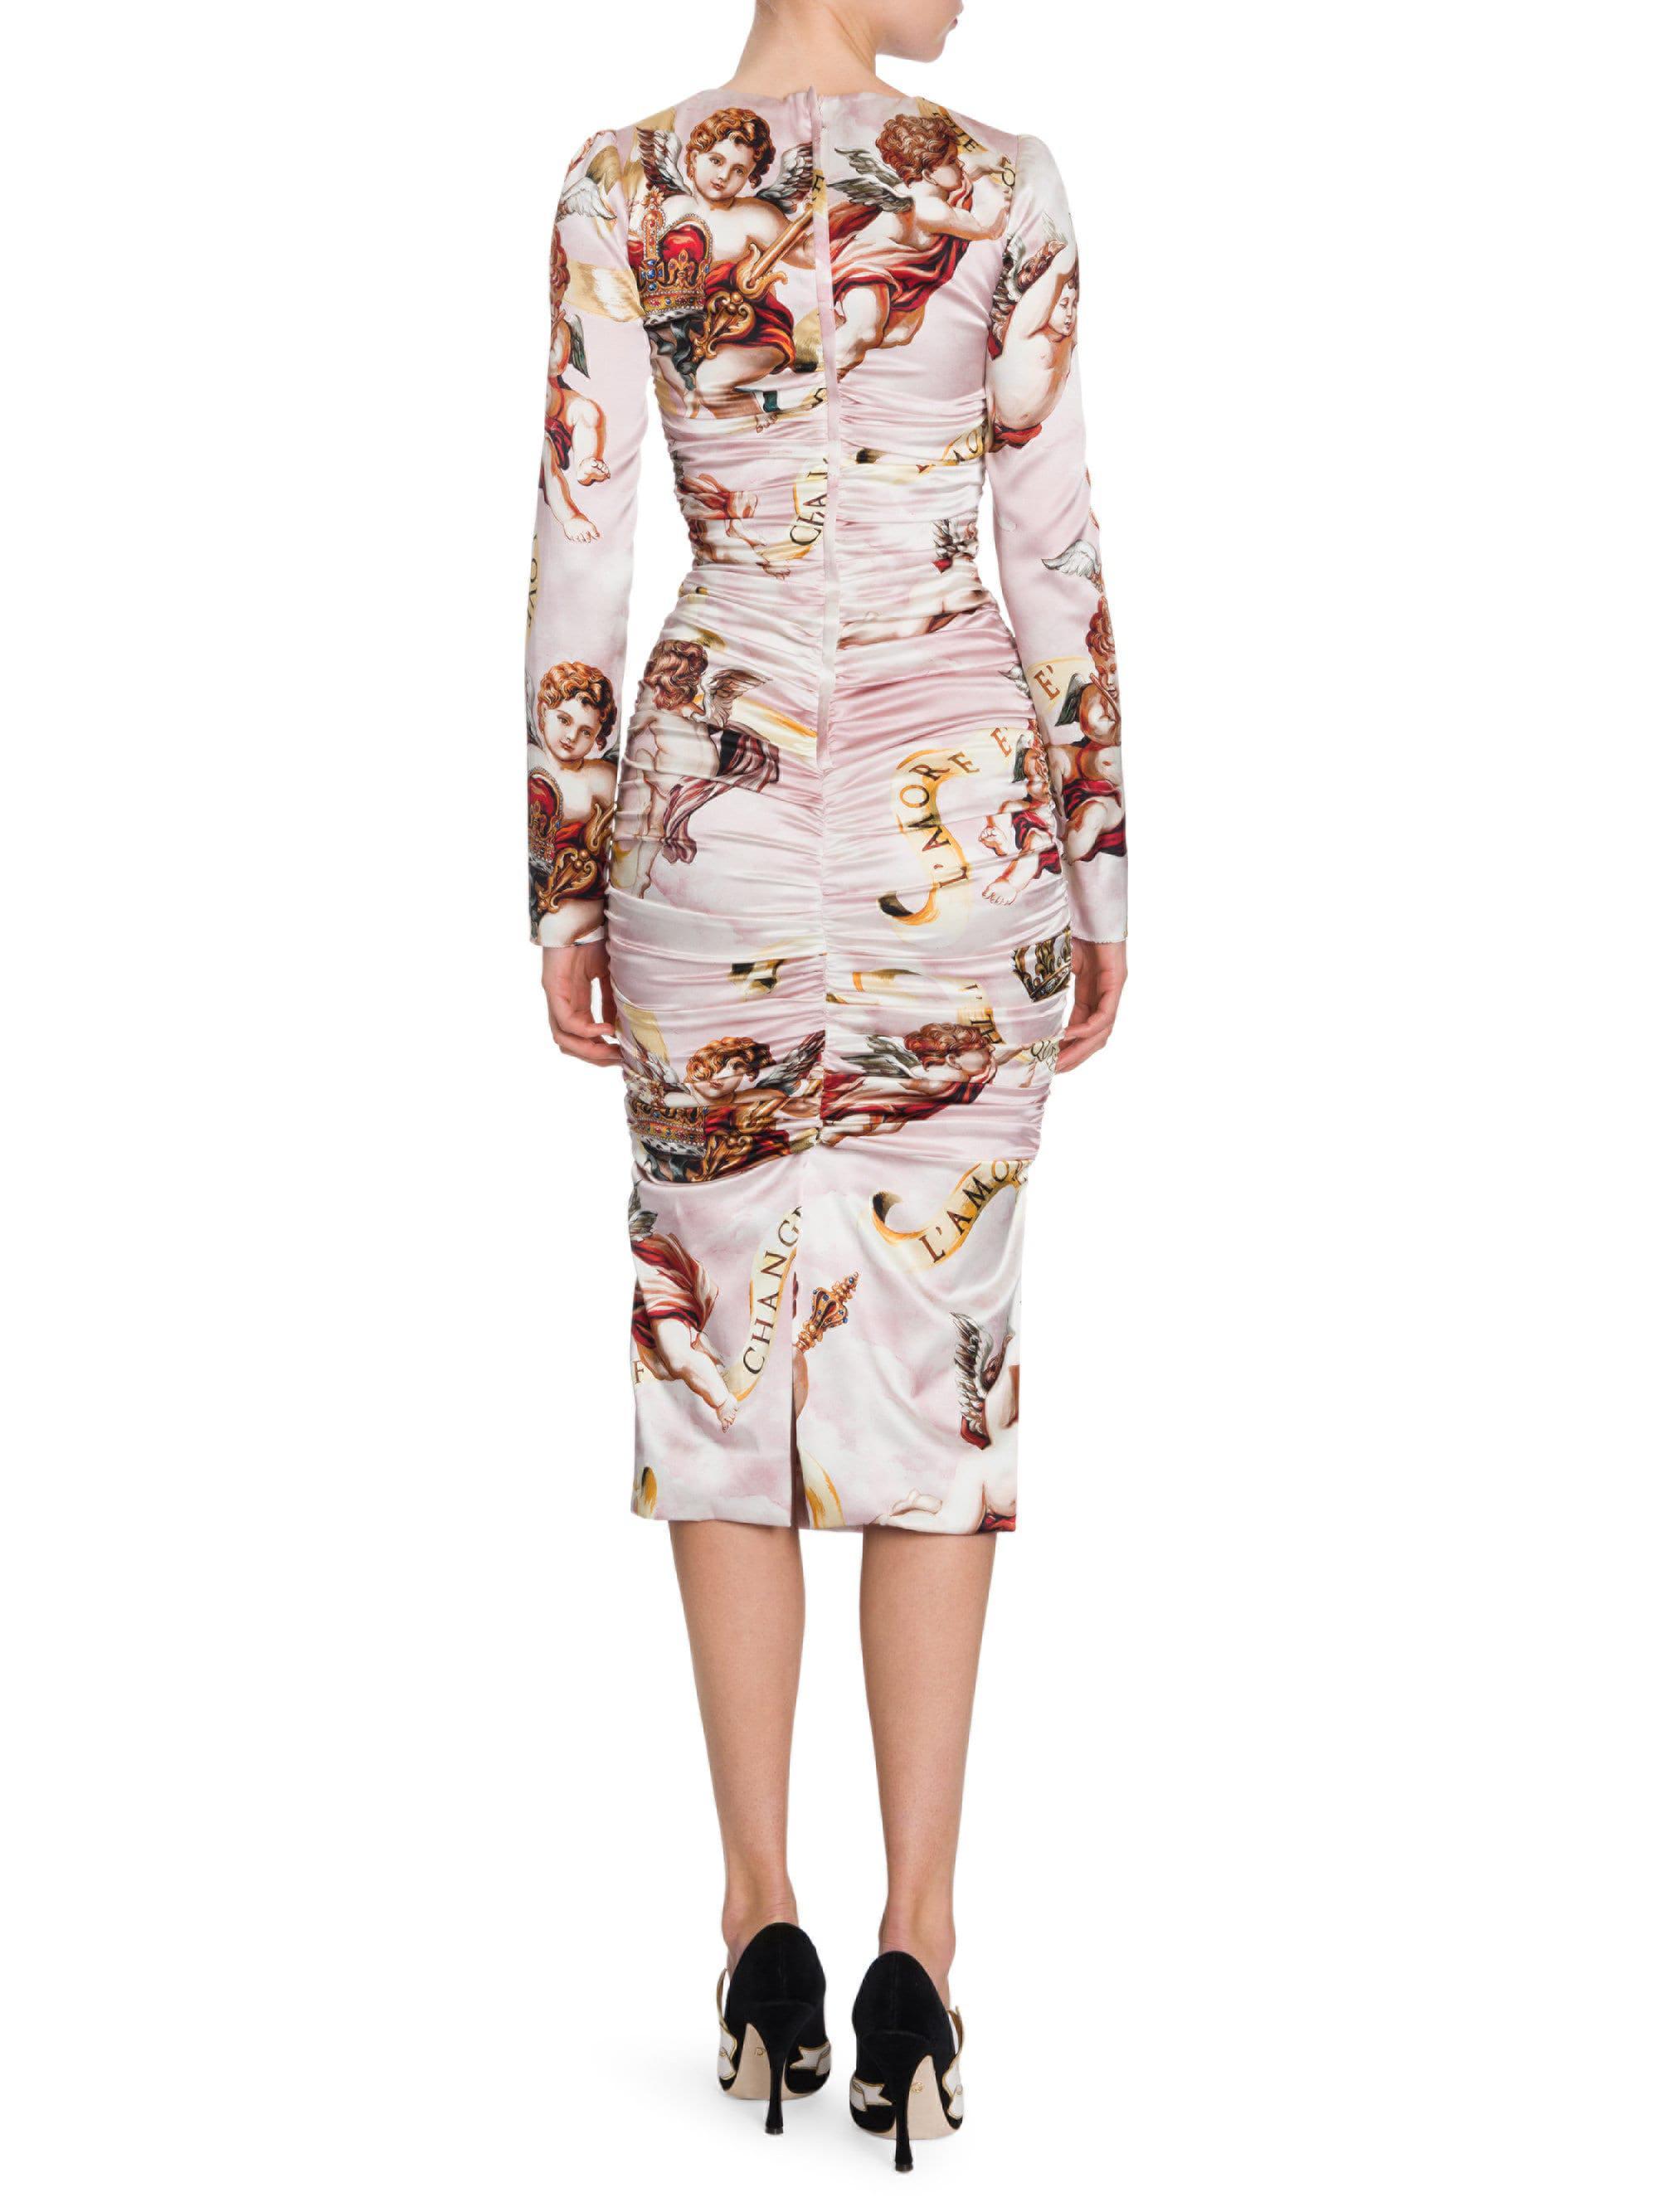 90a7dacb5f90 Dolce & Gabbana Cherub Print Satin Bodycon Dress in Pink - Lyst